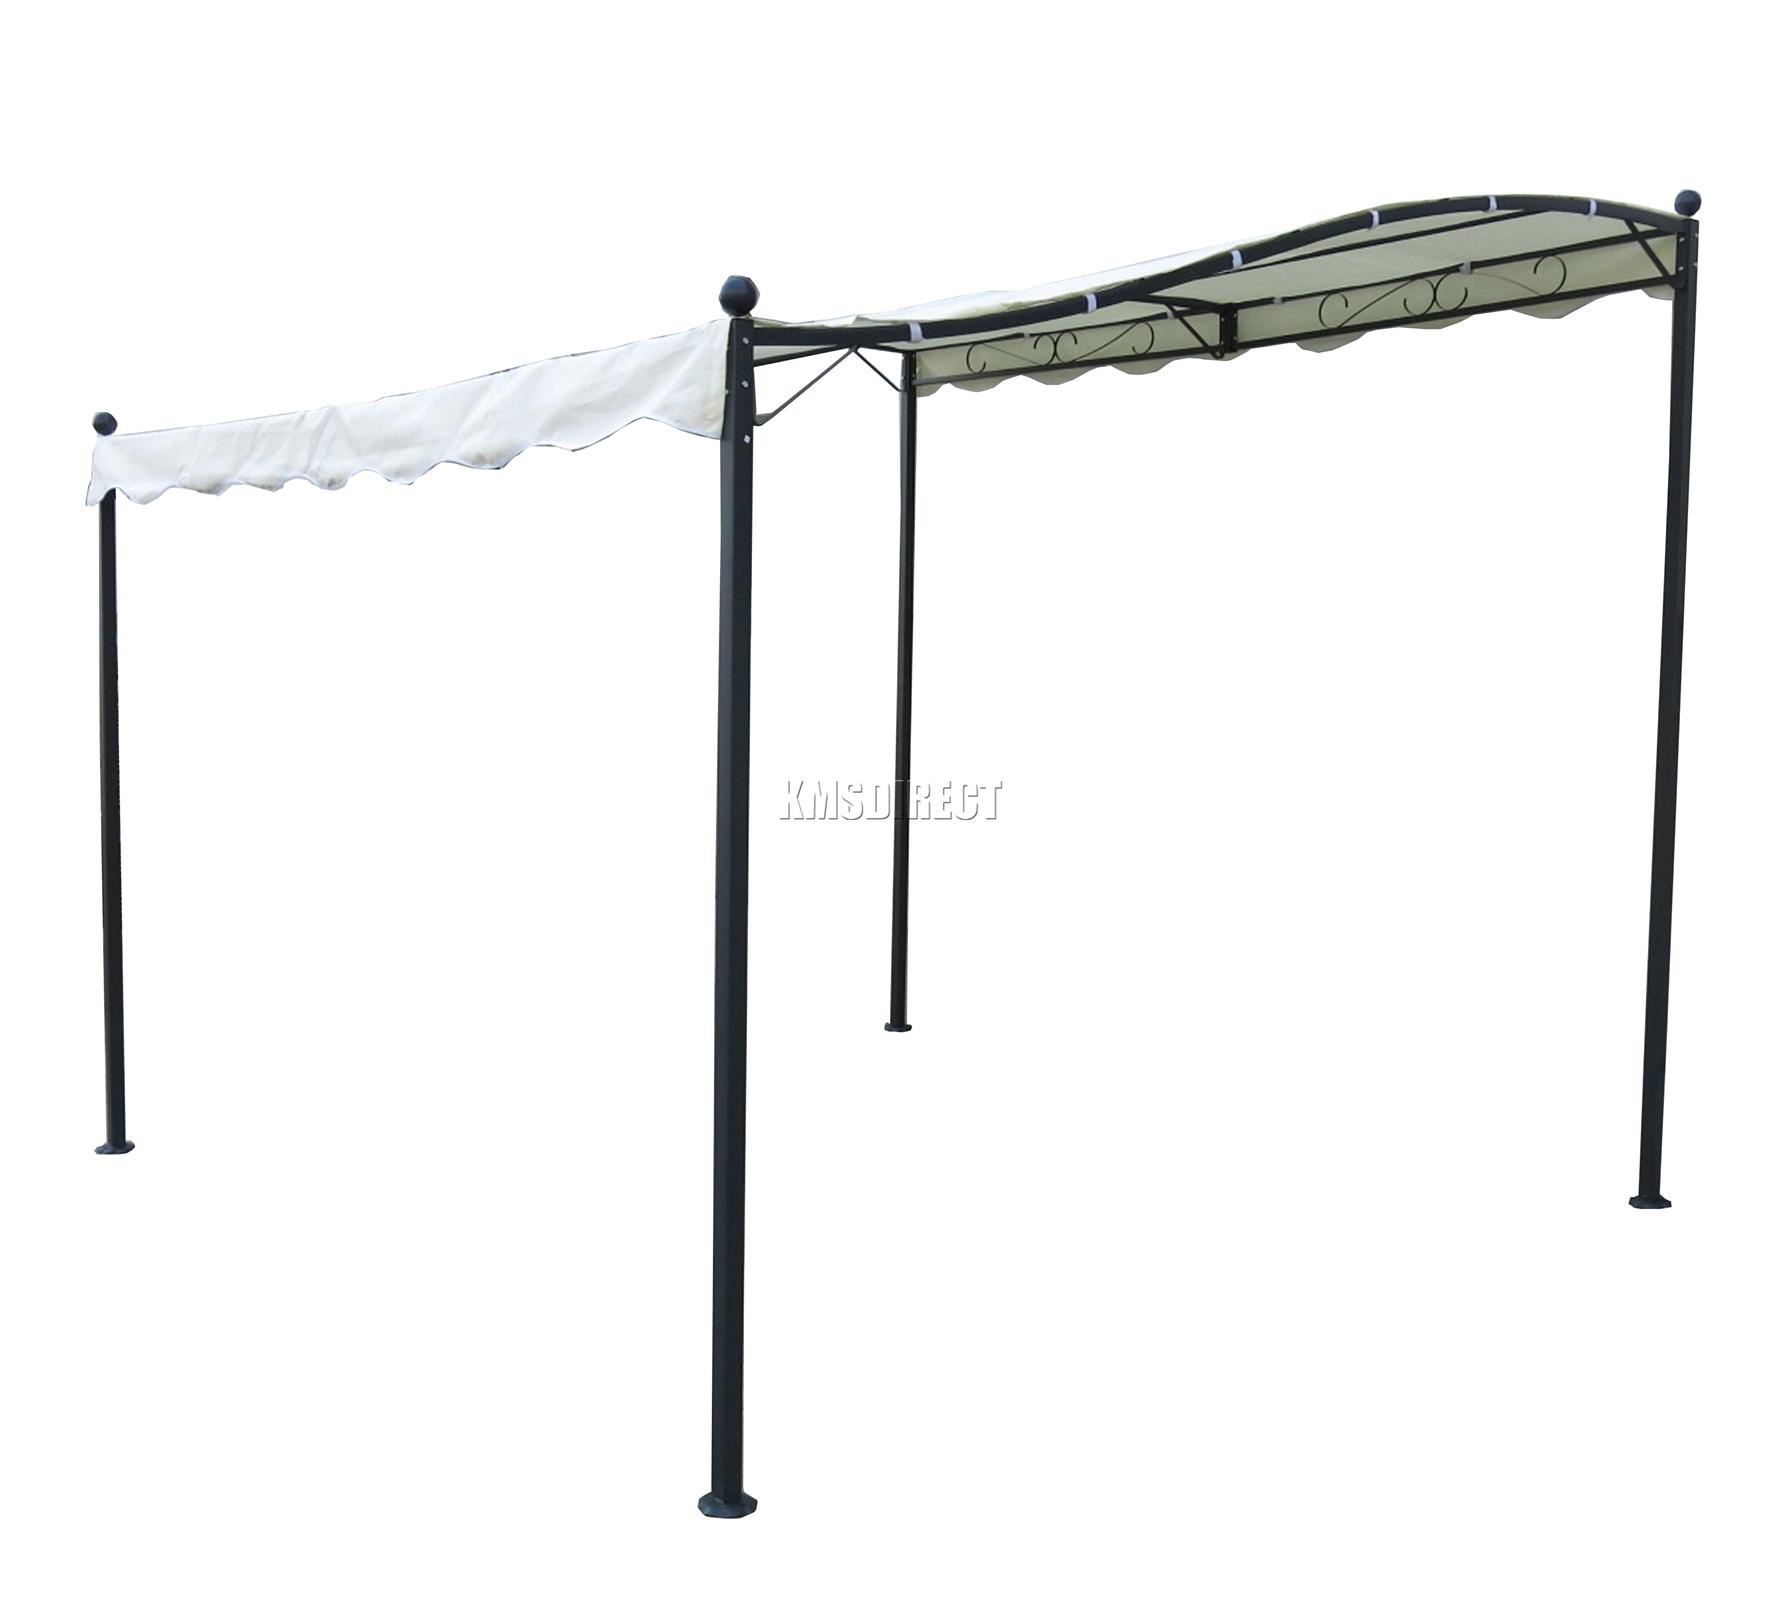 Foxhunter metal wall gazebo awning garden marquee canopy for Carpas para jardin